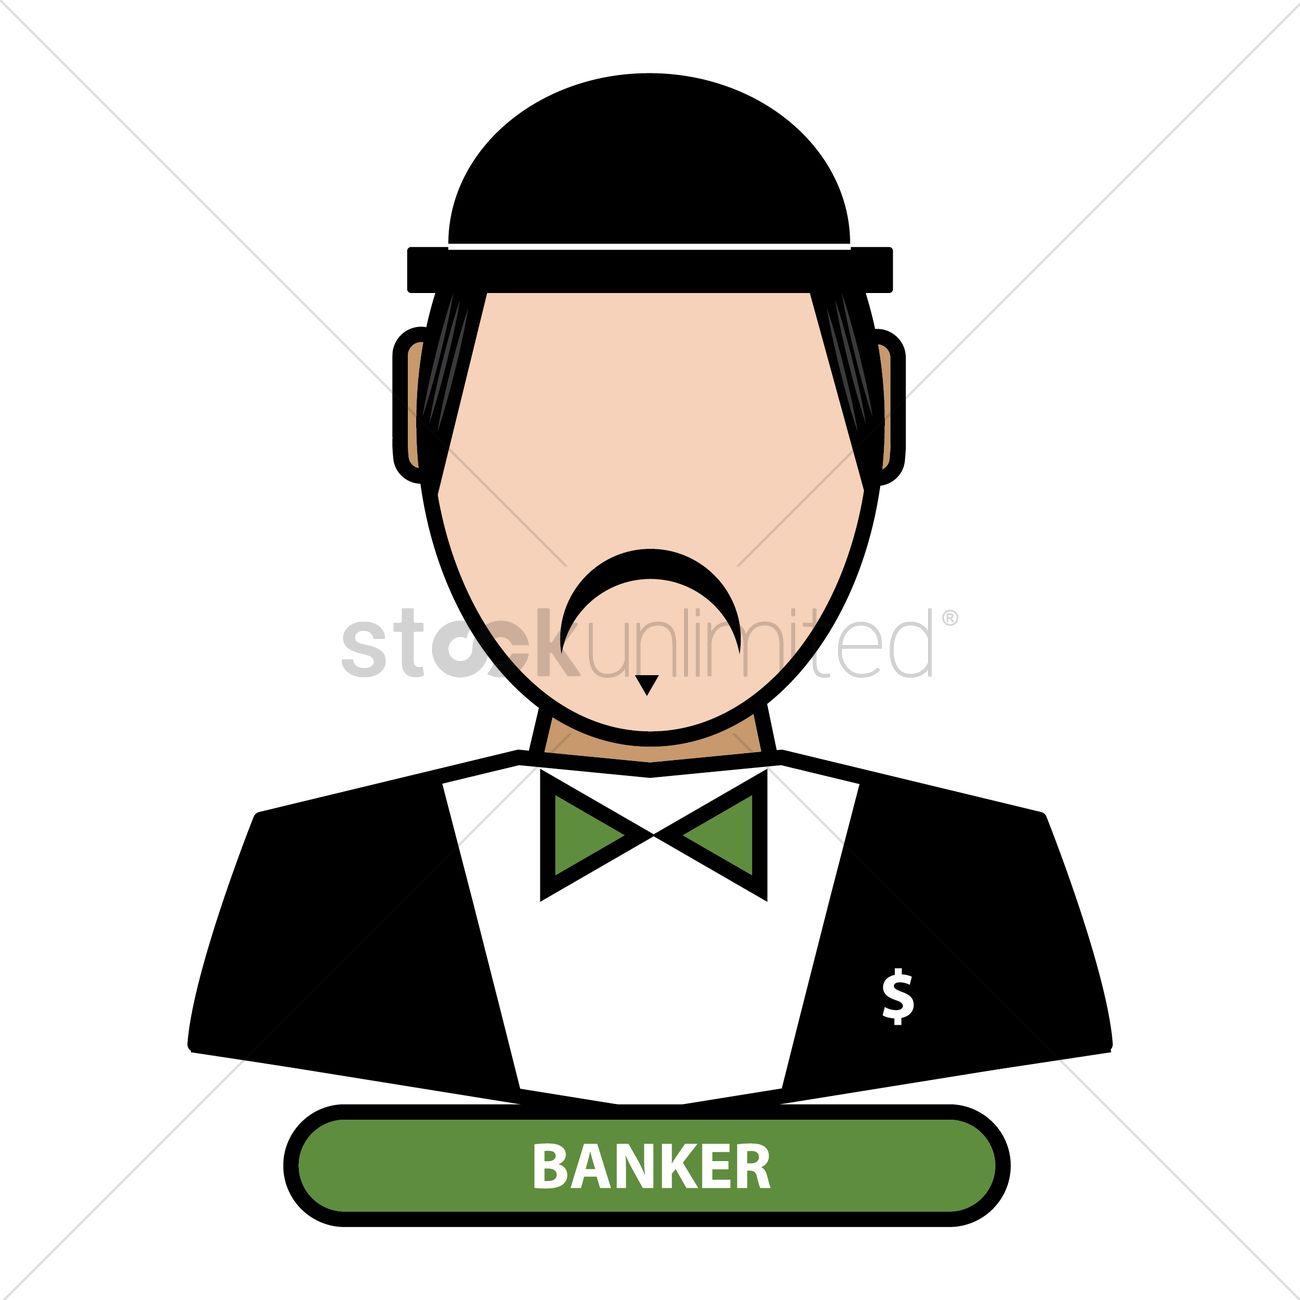 Banker Vector Image - 1625281 | StockUnlimited